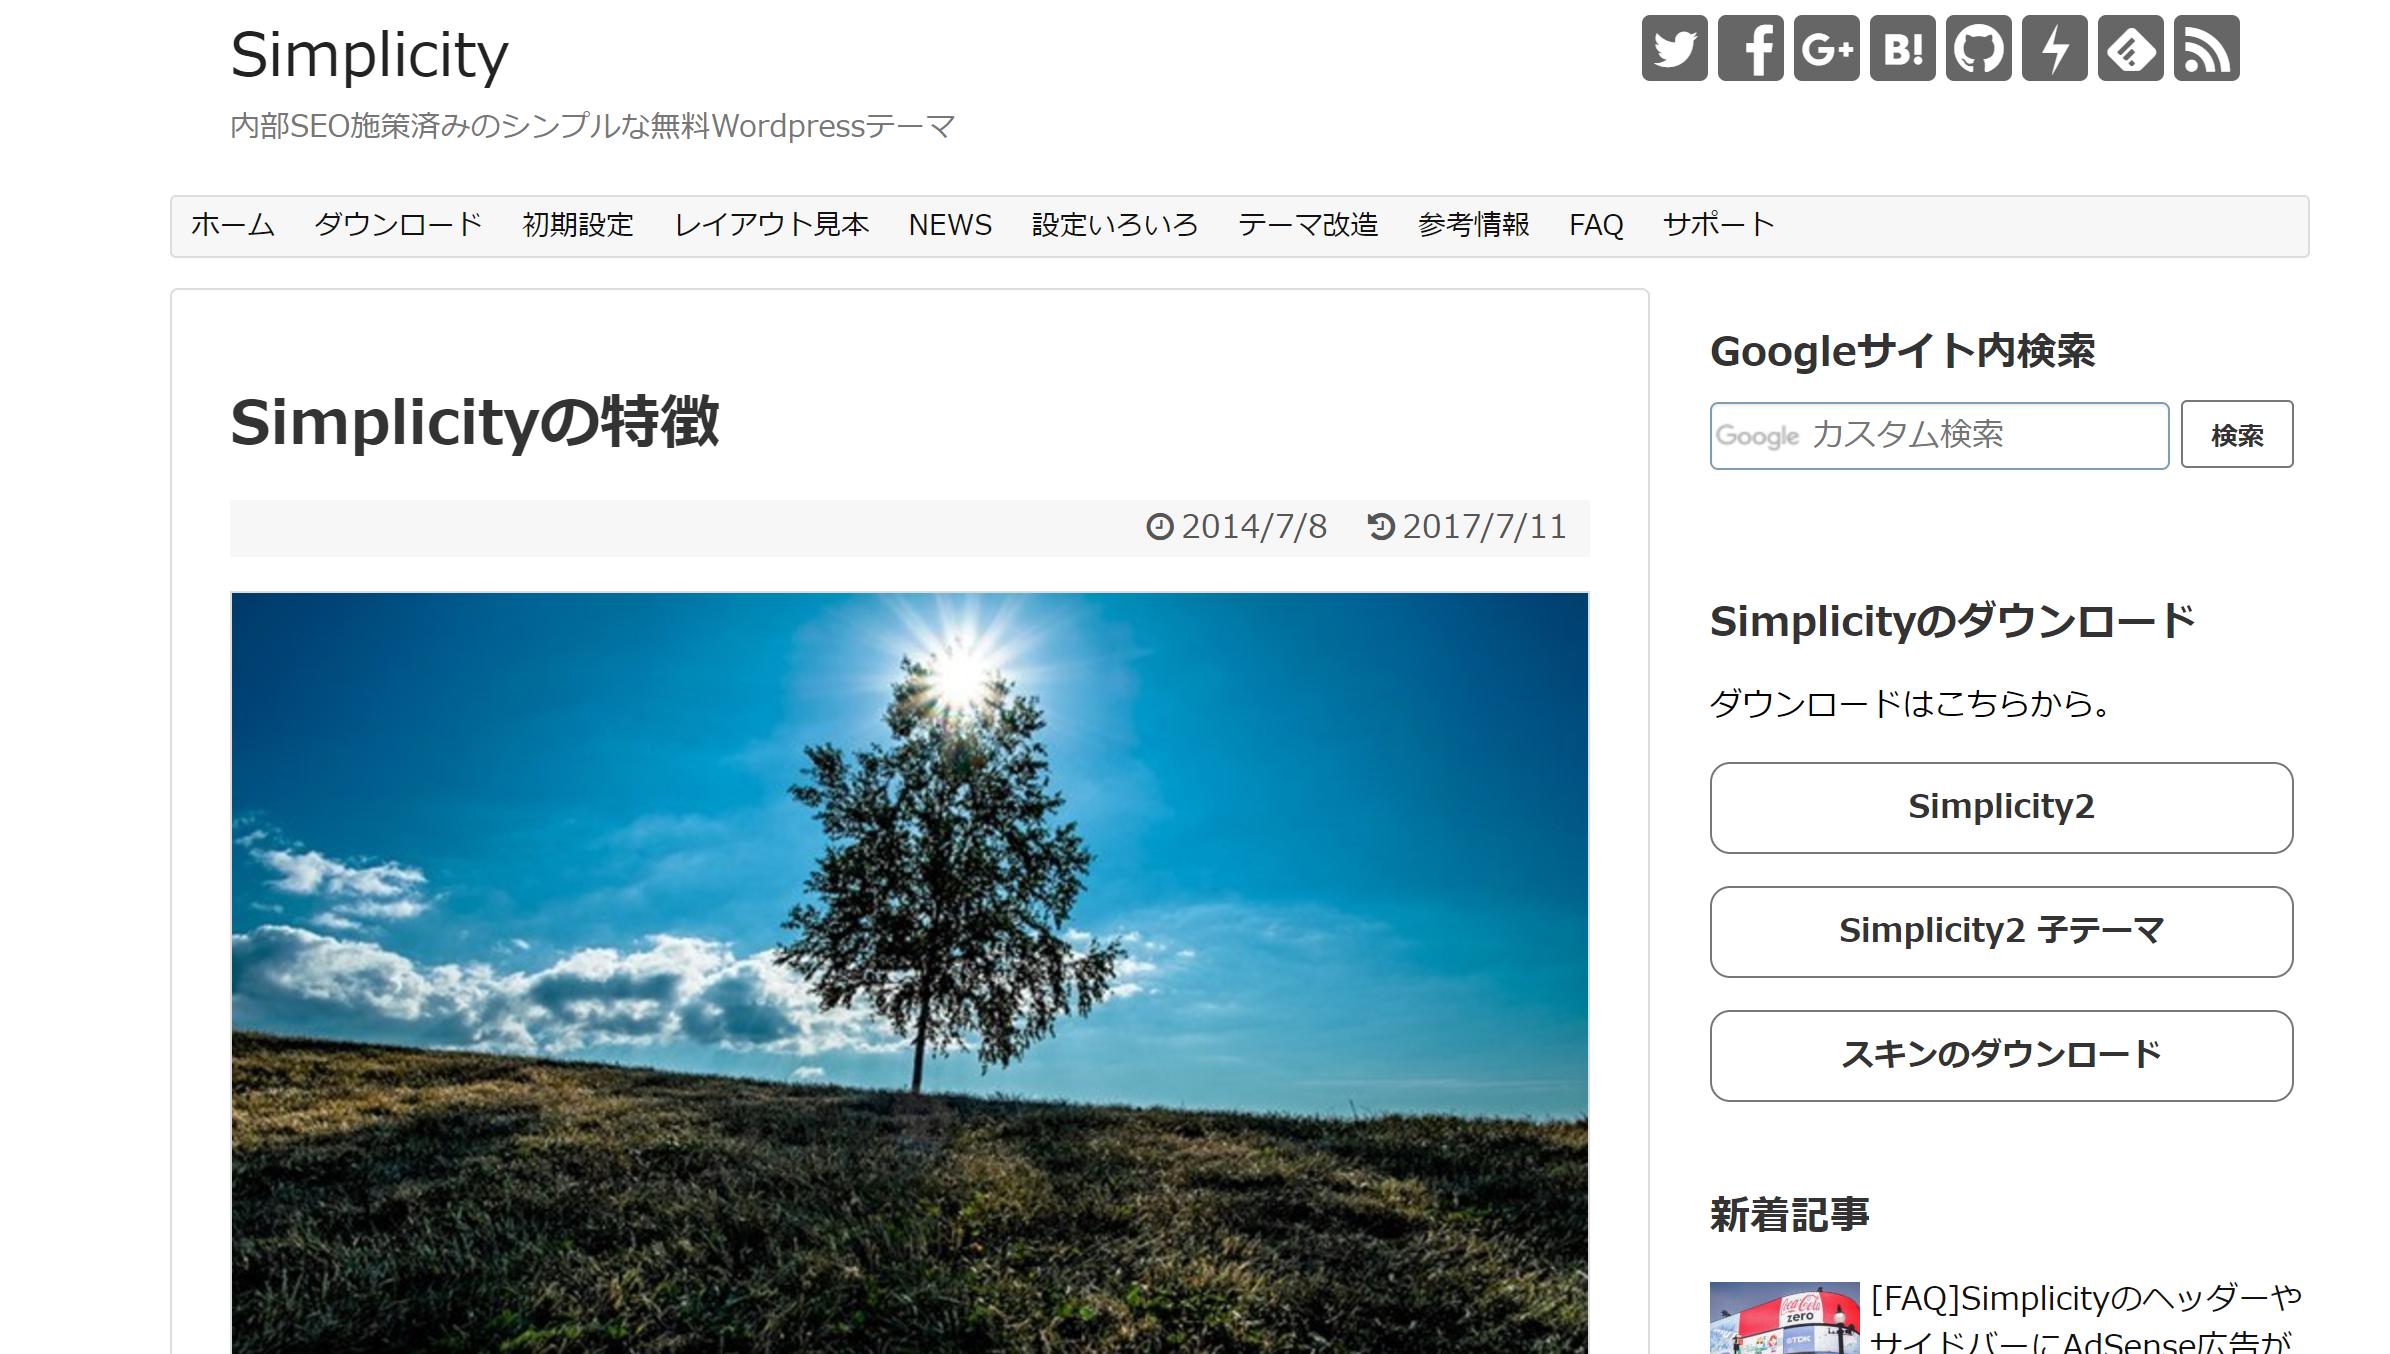 simplicity - Wordpressで会員サイトを作るプラグイン5選とおすすめテーマ3選